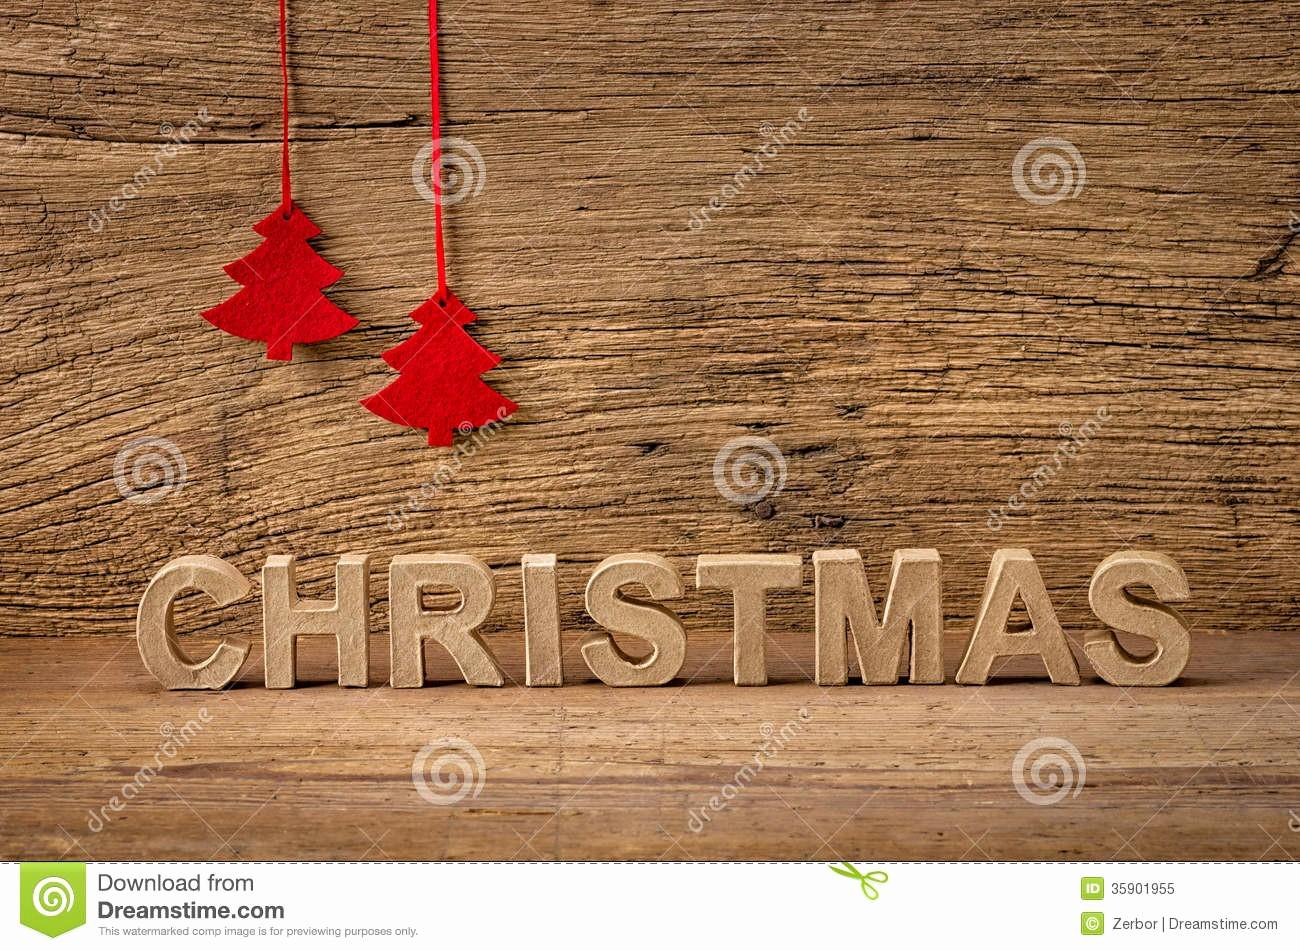 Christmas Background Images for Word Elegant the Word Christmas In Front A Wooden Background Stock